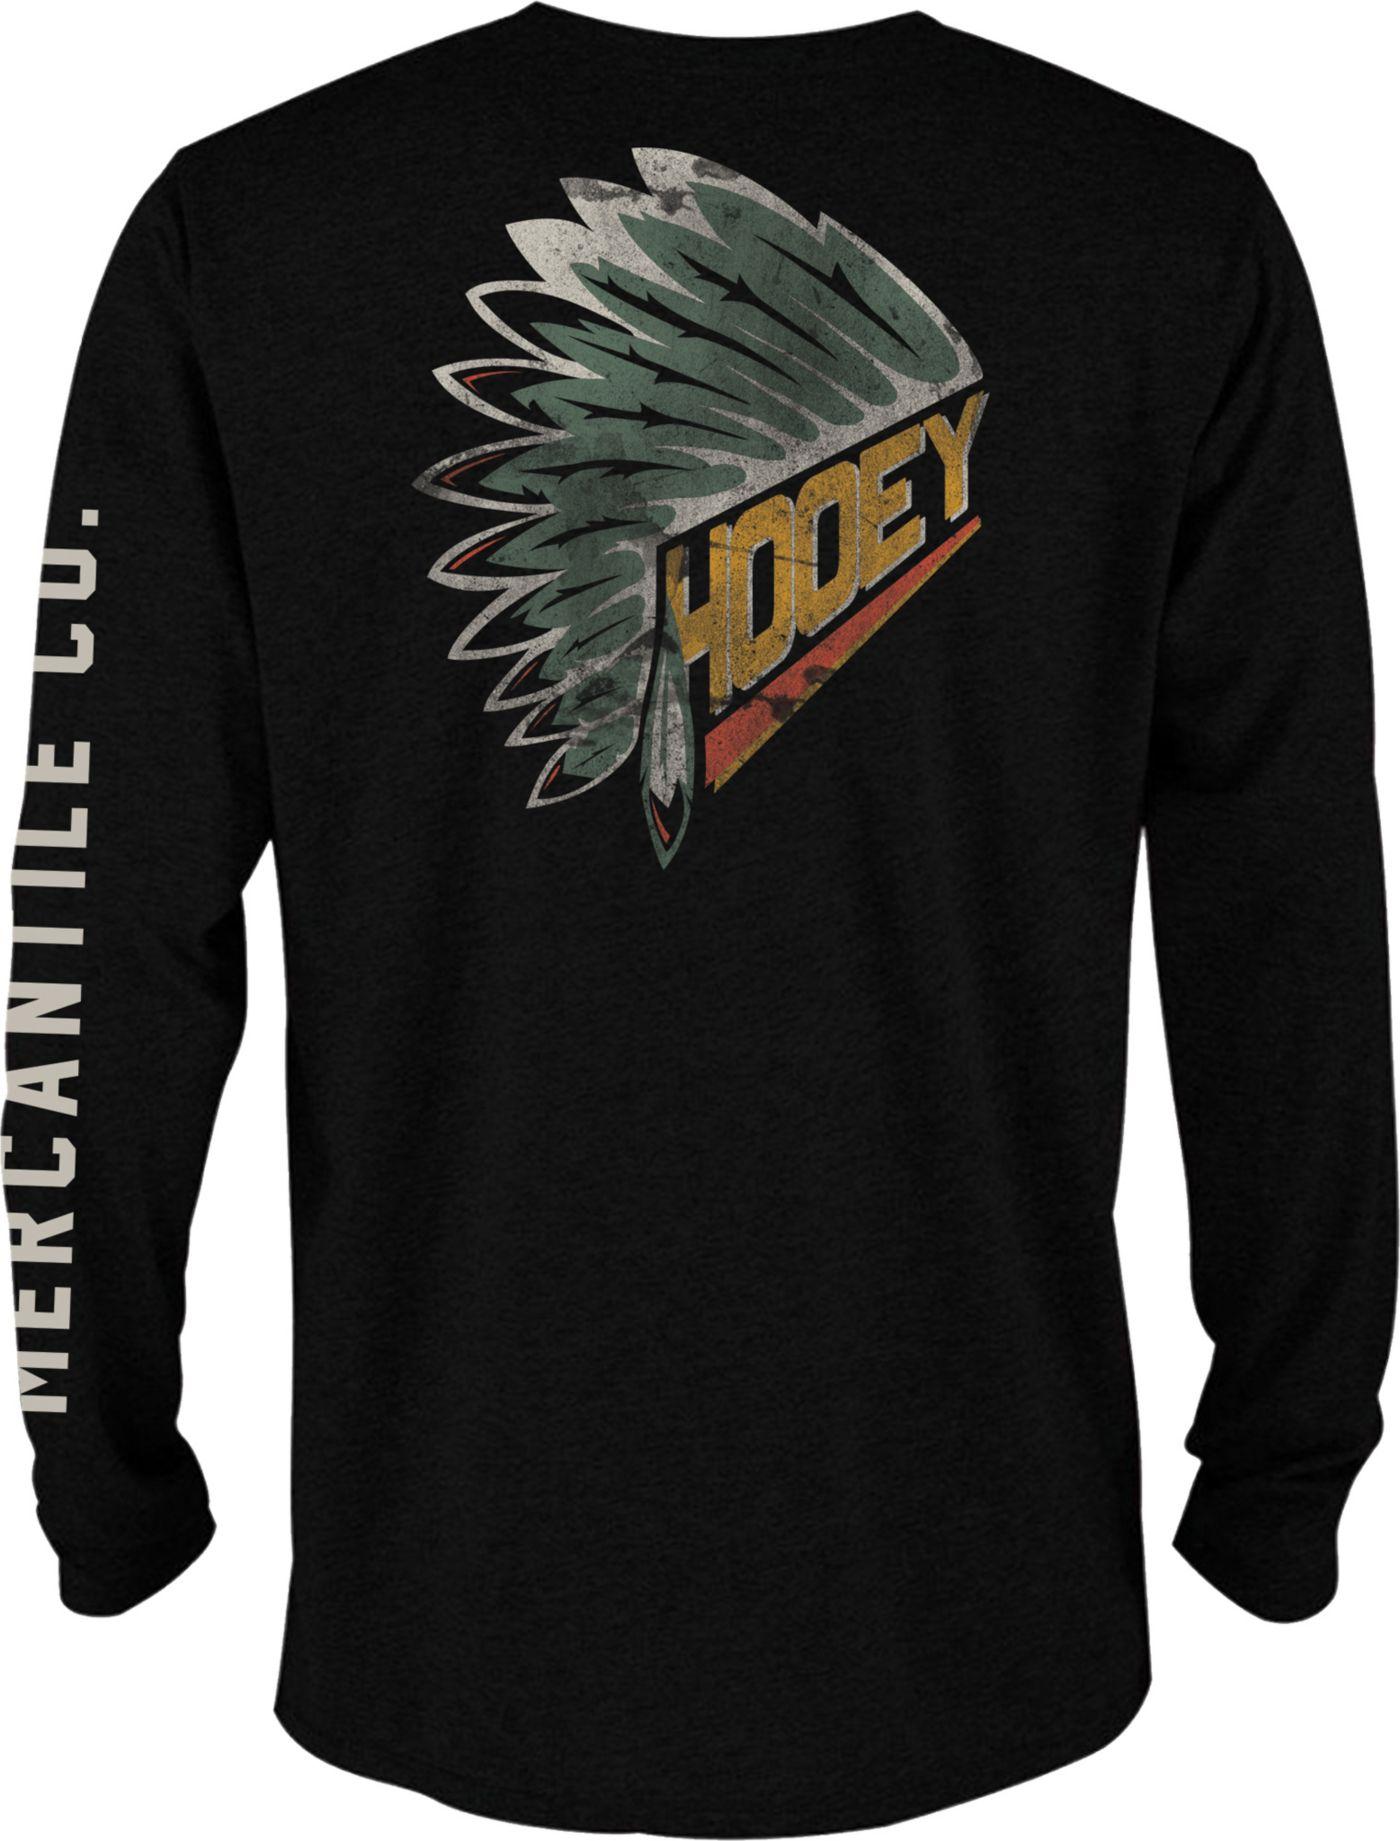 Hooey Men's Headdress Mercantile Co. Long Sleeve Shirt